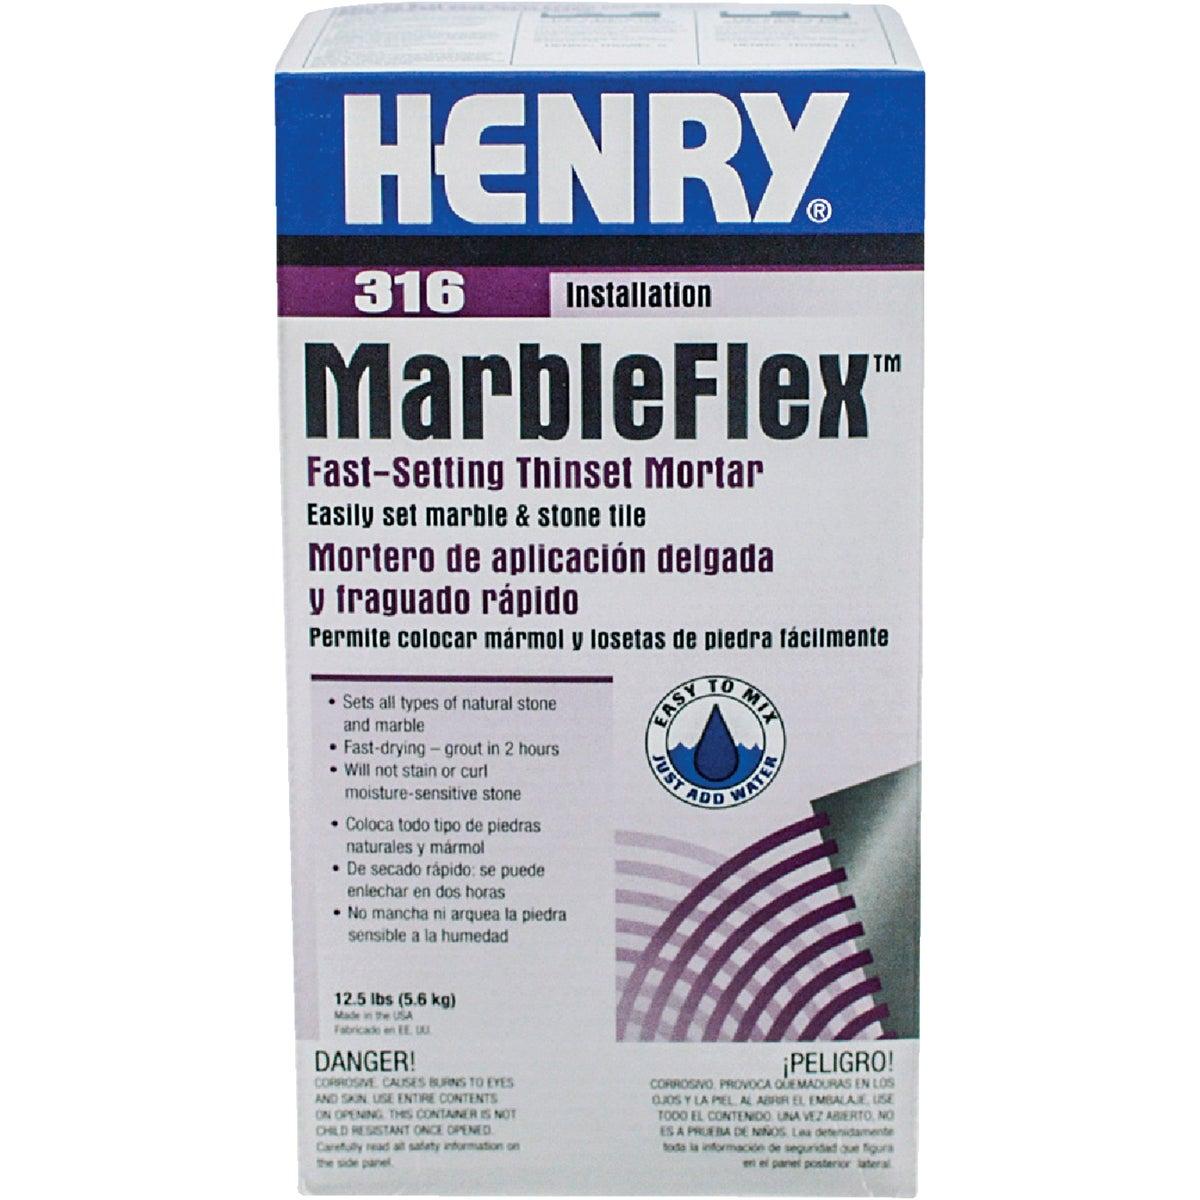 12.5Lb Marbleflex Mortar